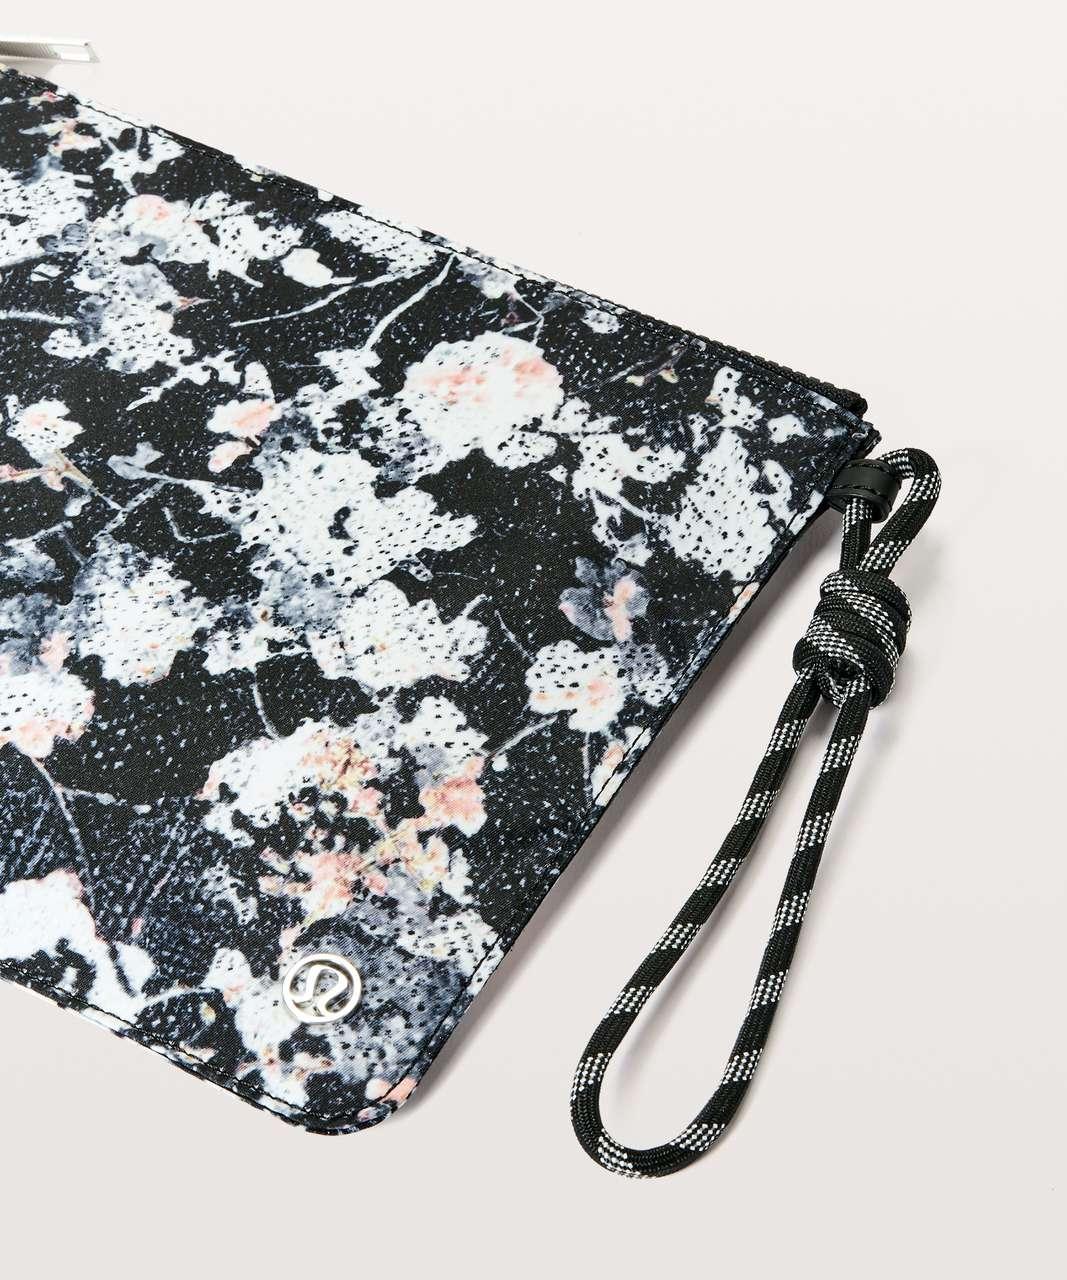 Lululemon All Zipped Up Pouch - Mini Spring Bloom Multi Black